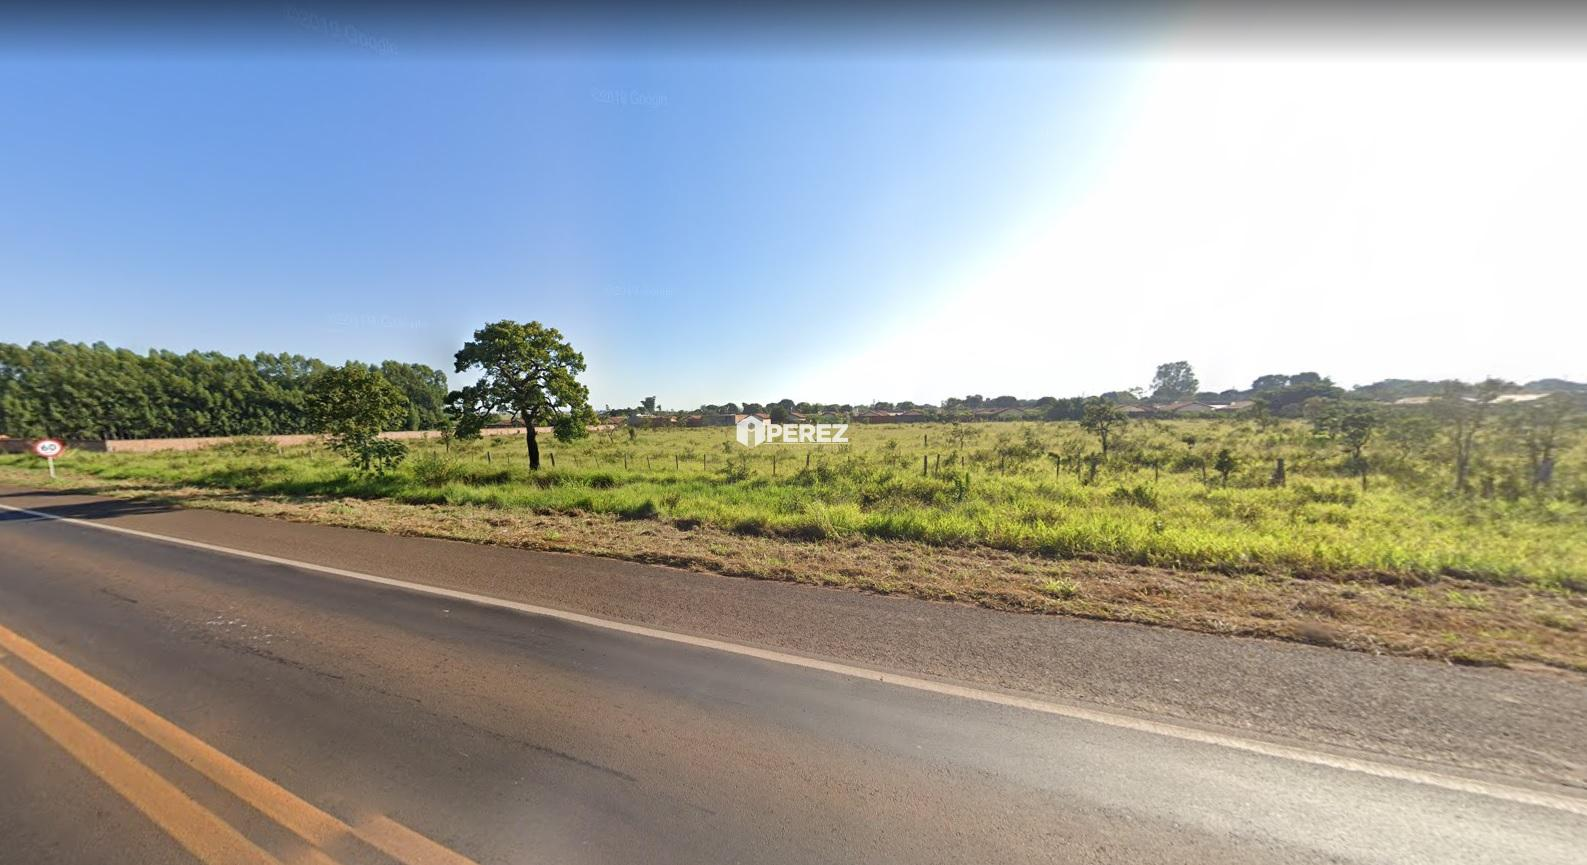 aluguel-campo-grande-ms-area-radialista-edgar-lopes-de-faria-jardim-taruma-perez-imoveis